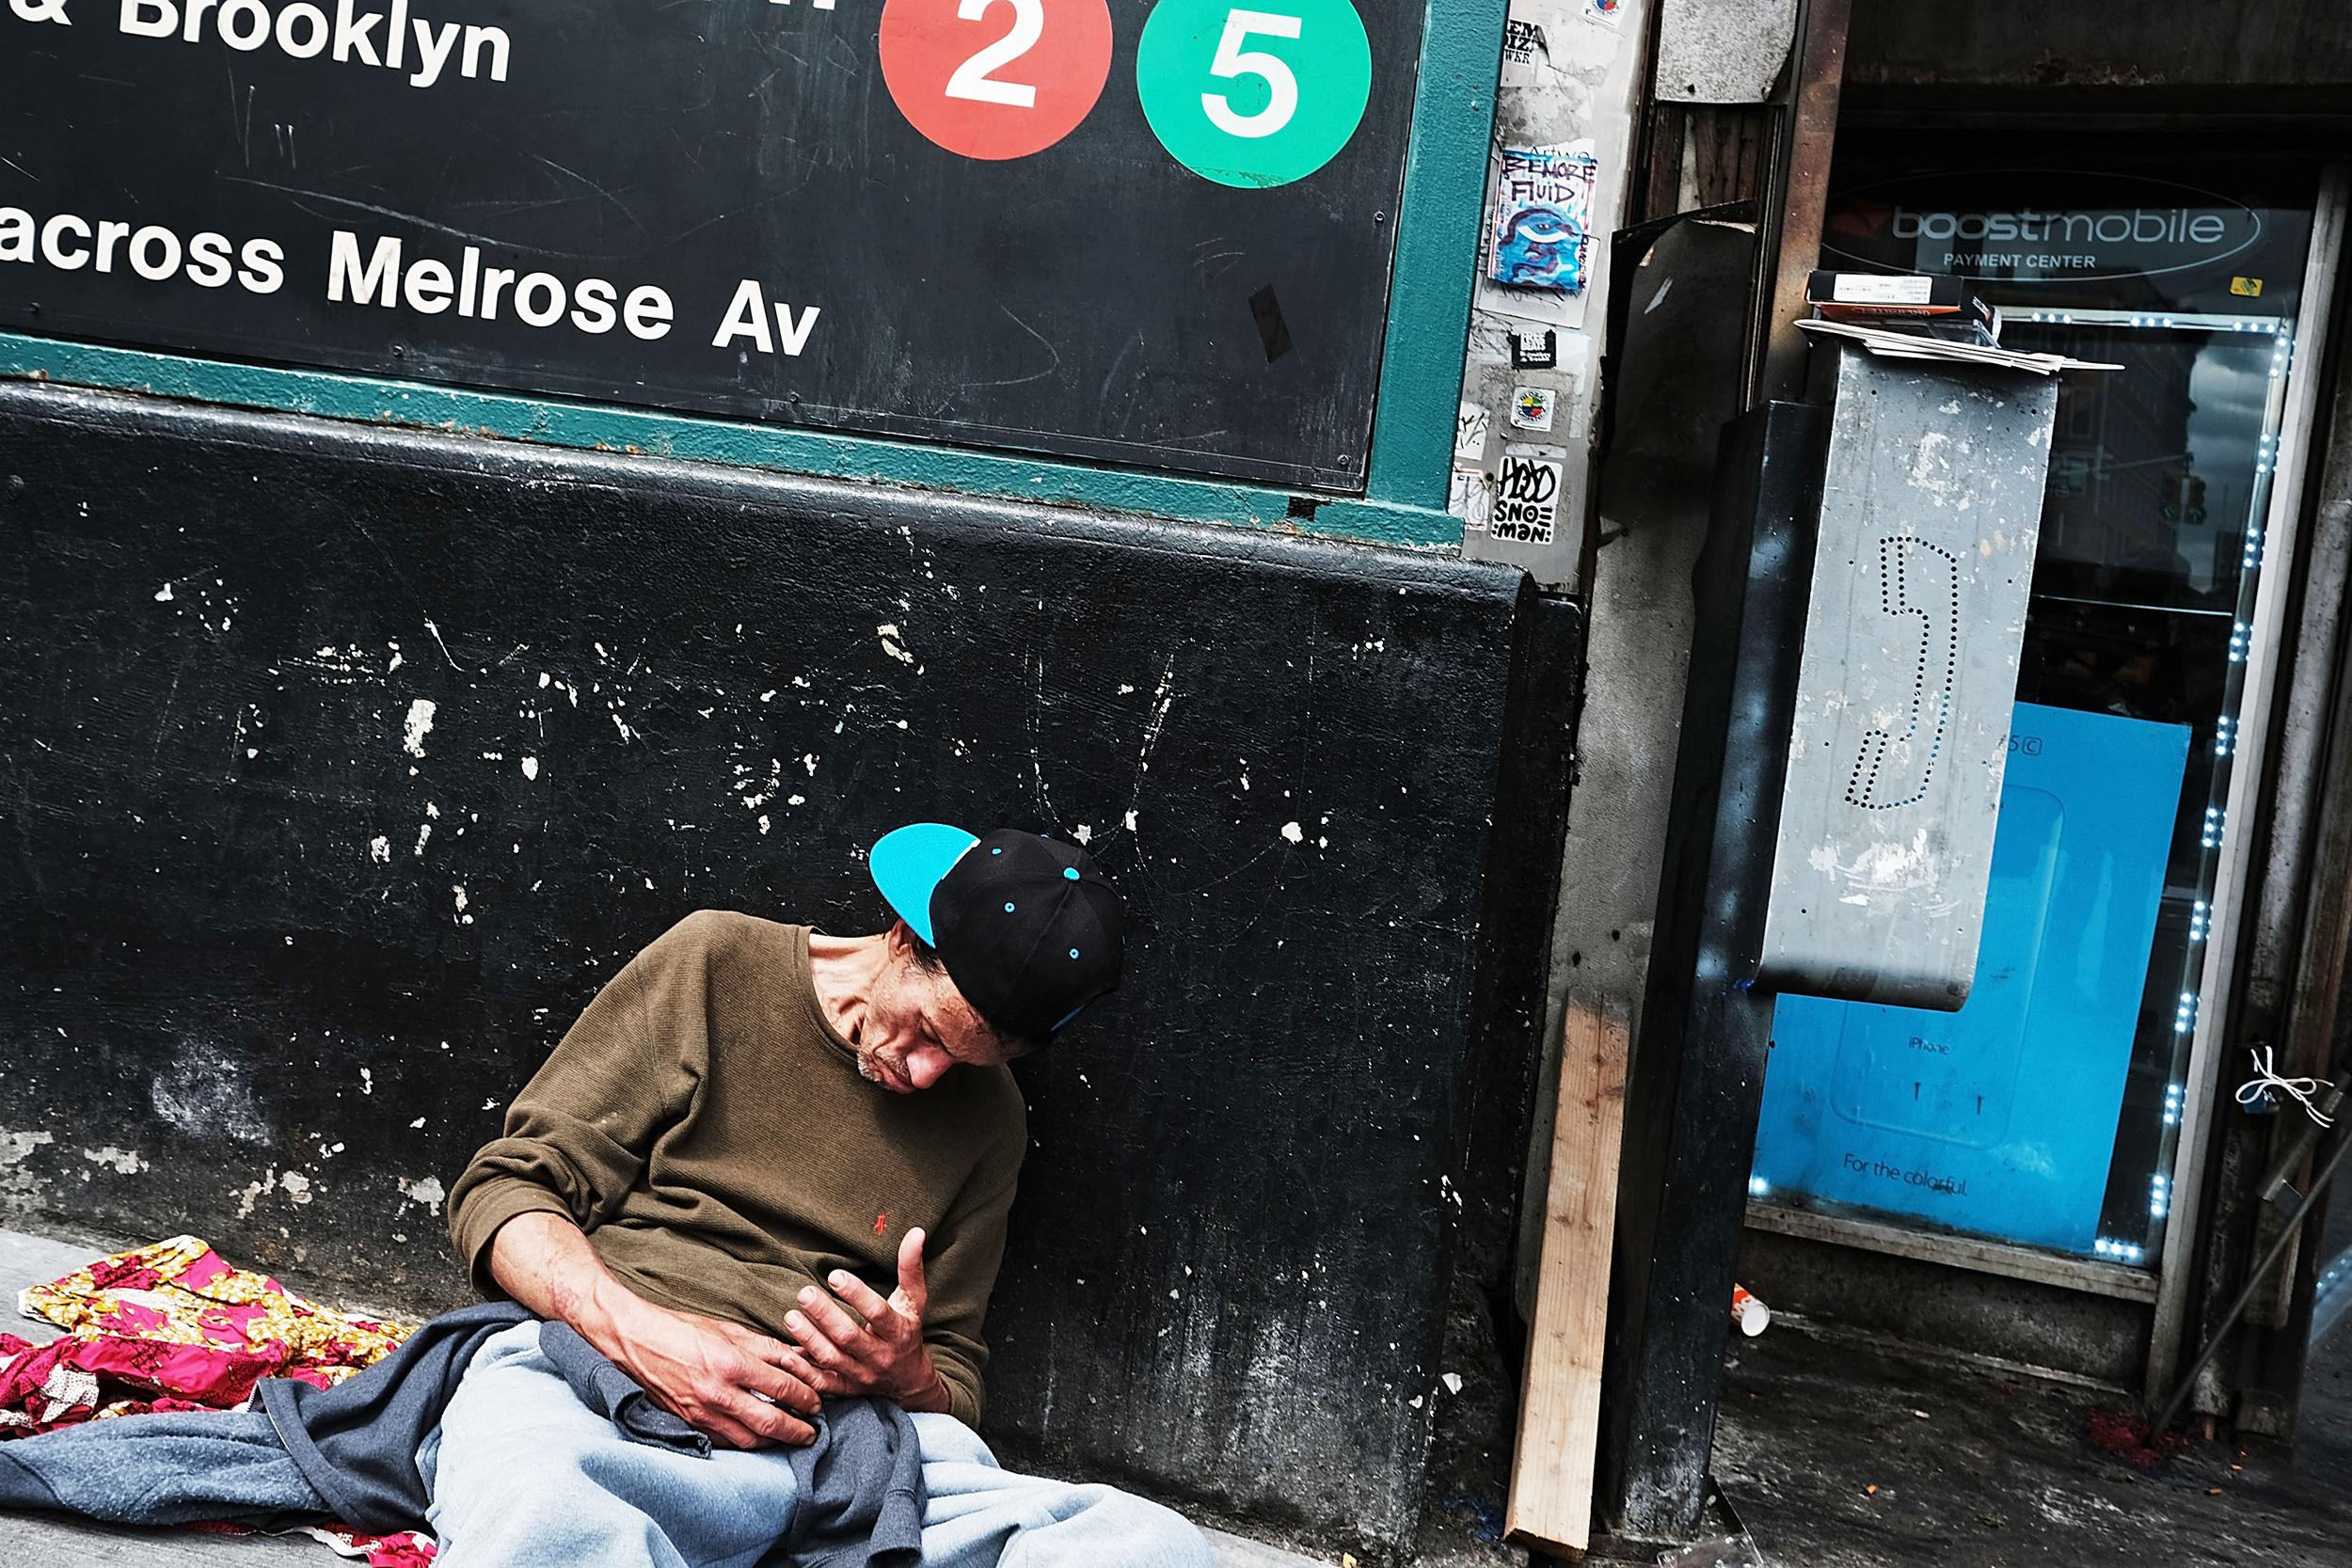 Image: Man on a South Bronx street